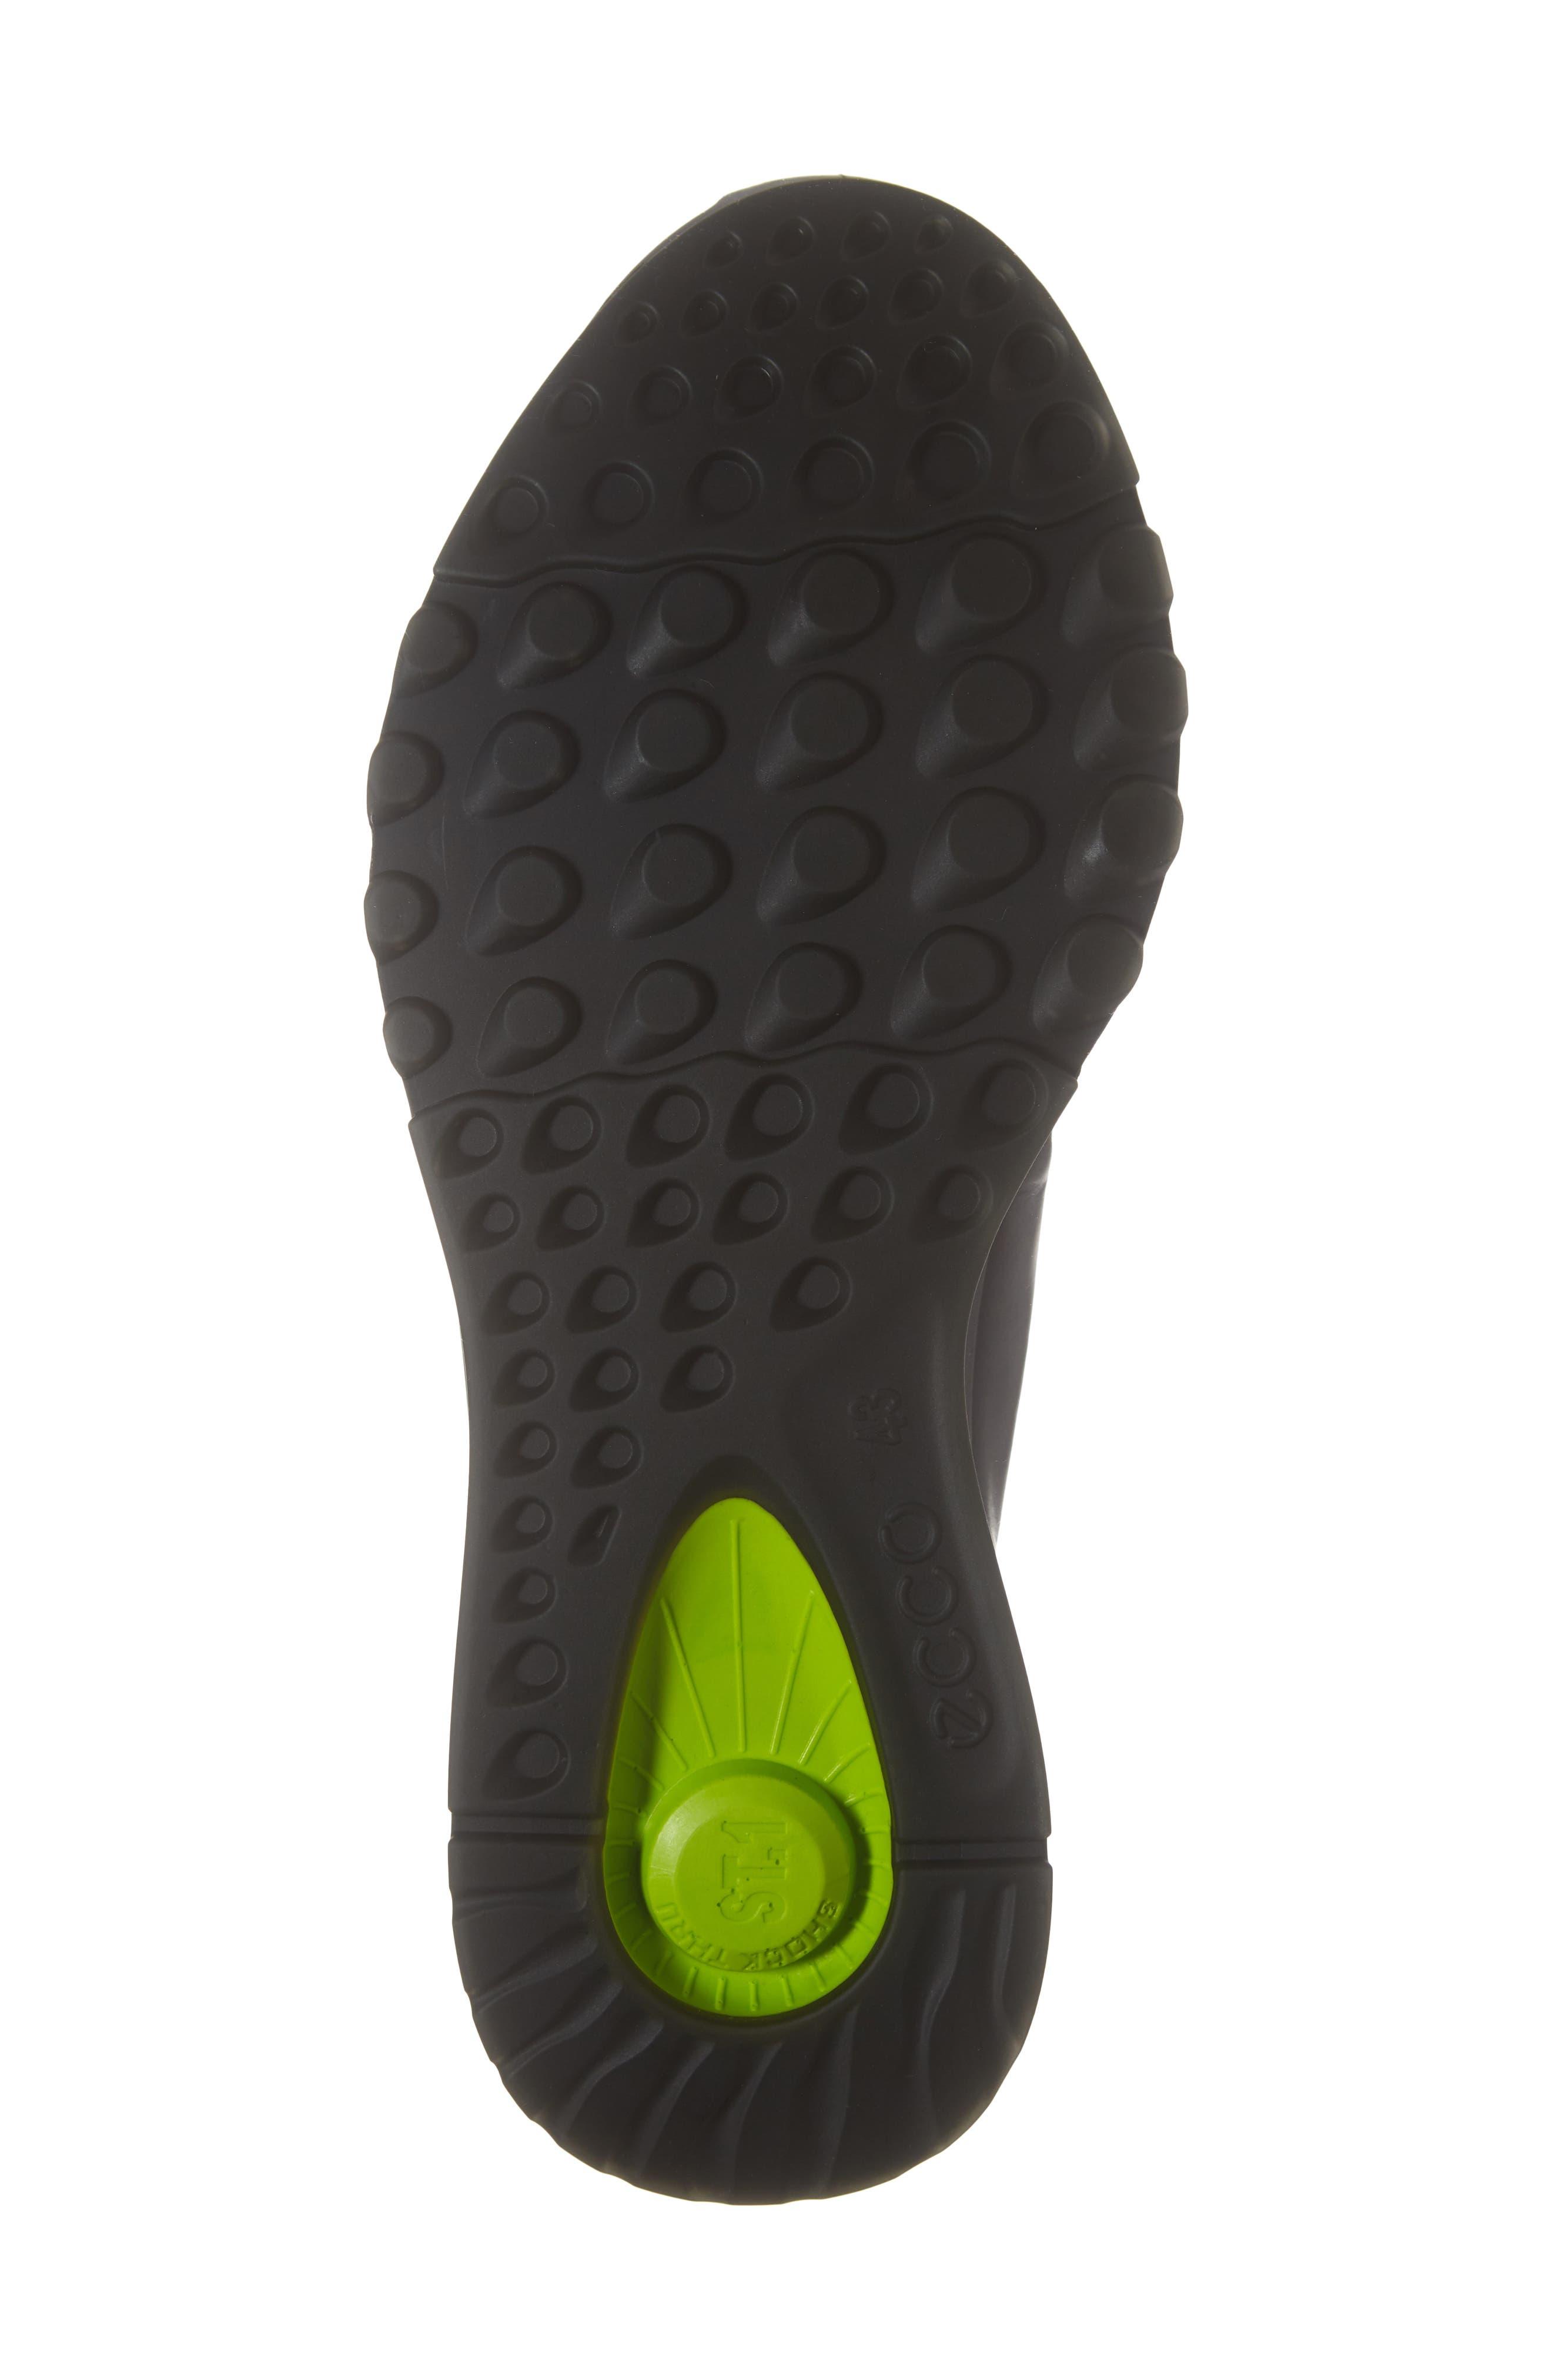 ST1 High Top Sneaker,                             Alternate thumbnail 6, color,                             BLACK/BLACK LEATHER